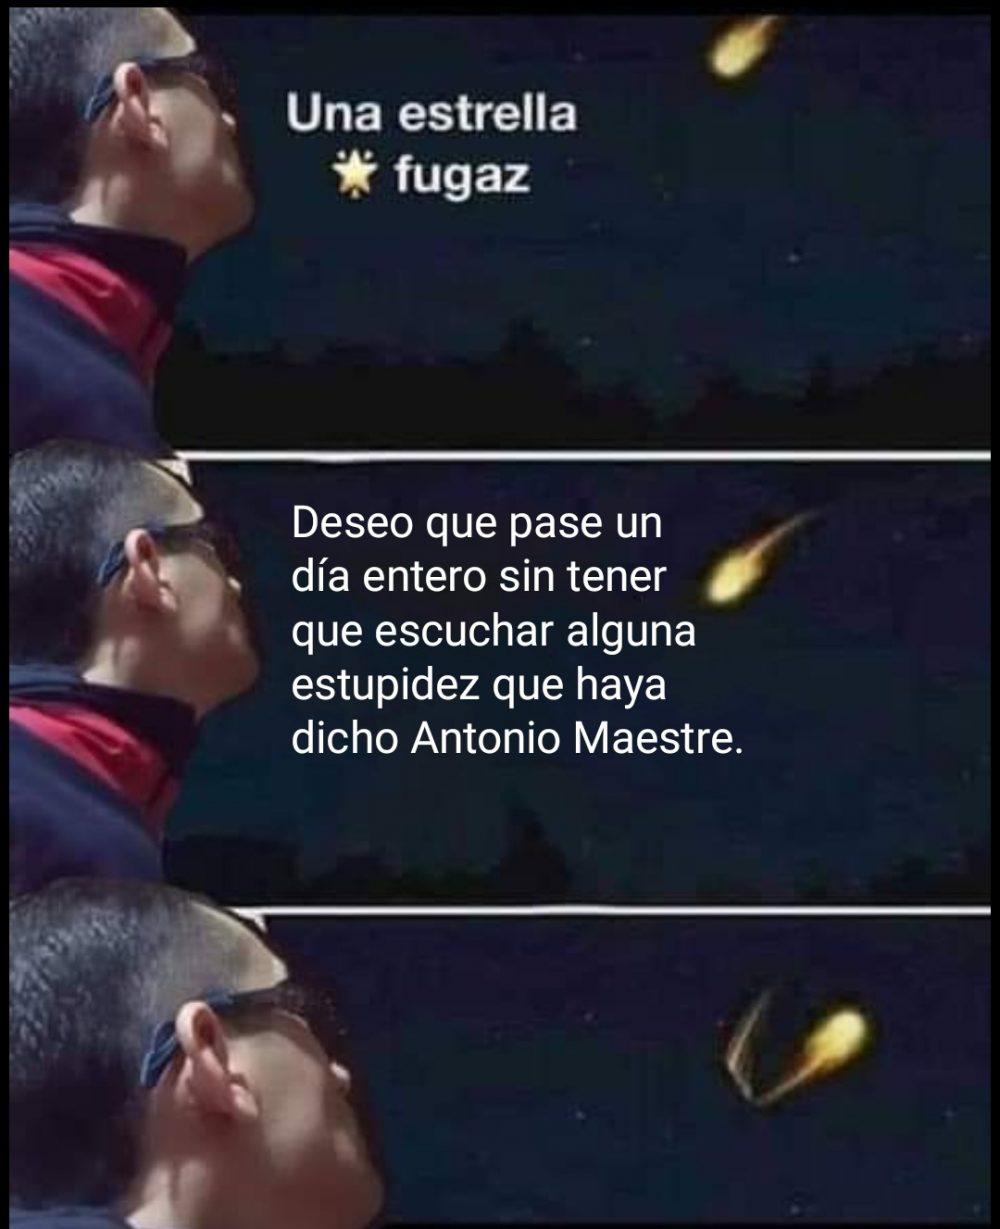 Antonio Maestre pescando zascas